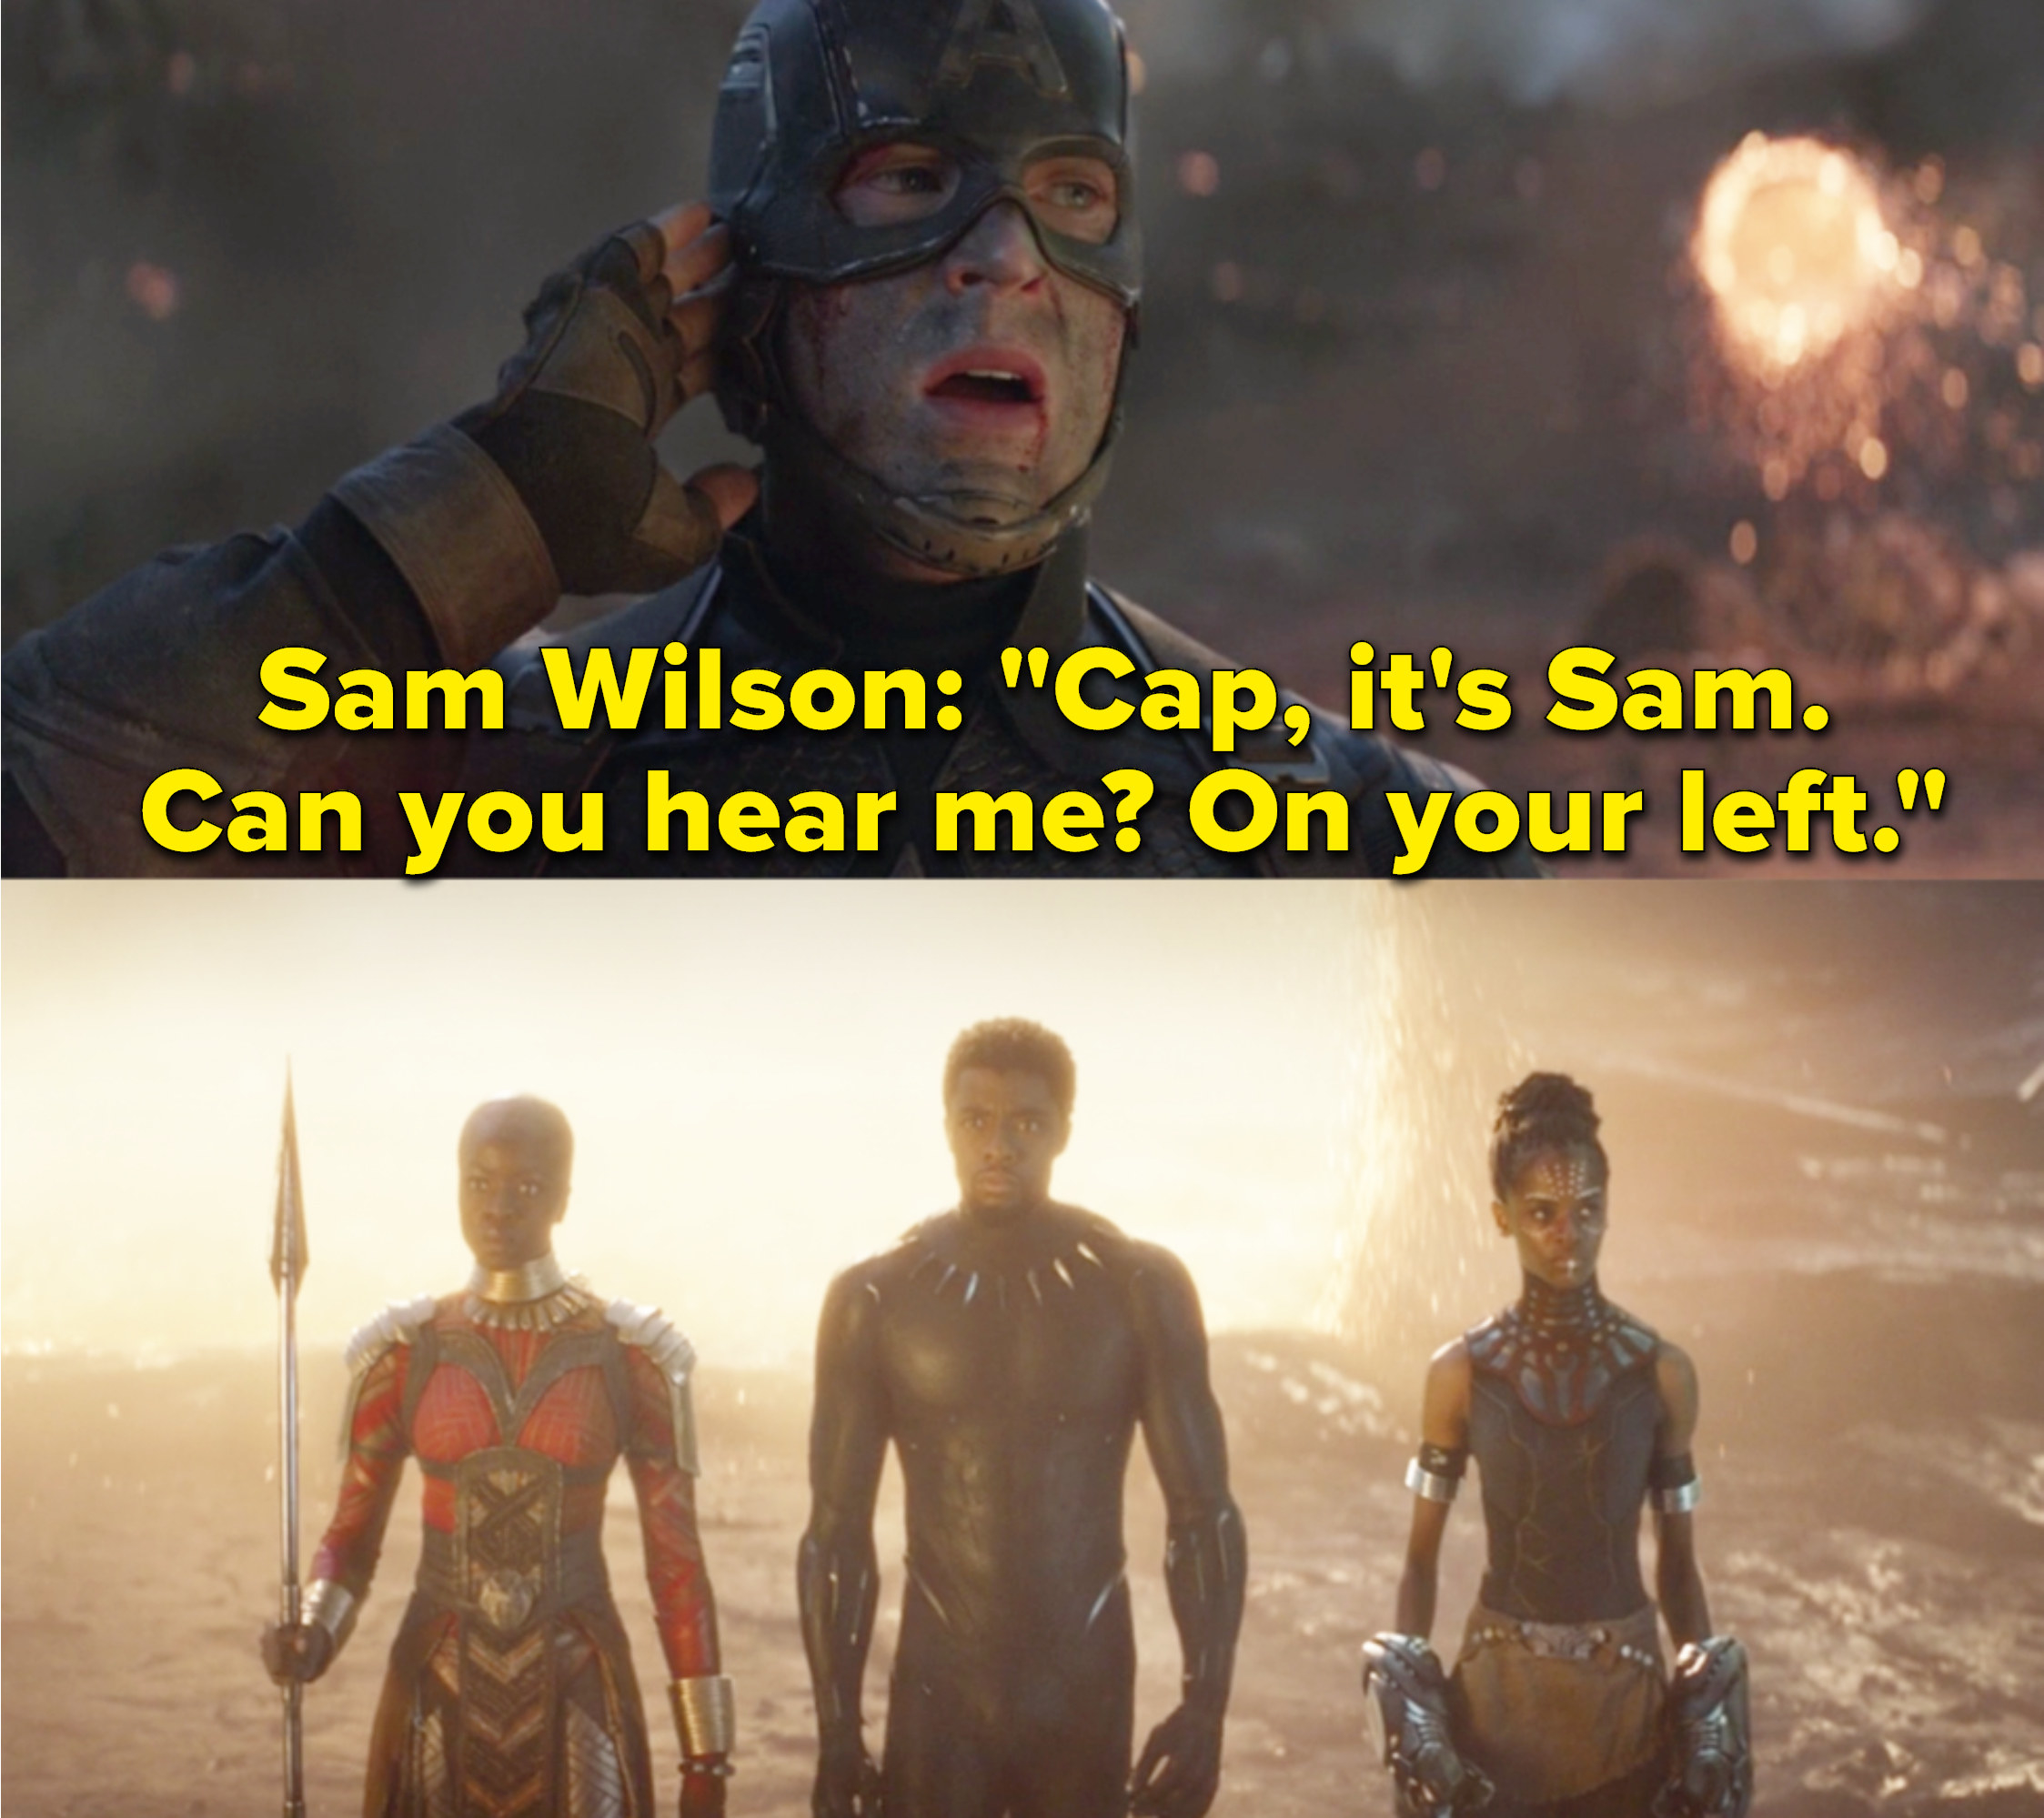 "Chris Evans as Steve Rogers / Captain America, Danai Gurira as Okoye, Chadwick Boseman as T'Challa / Black Panther, and Letitia Wright as Shuri in the movie ""Avengers: Endgame."""